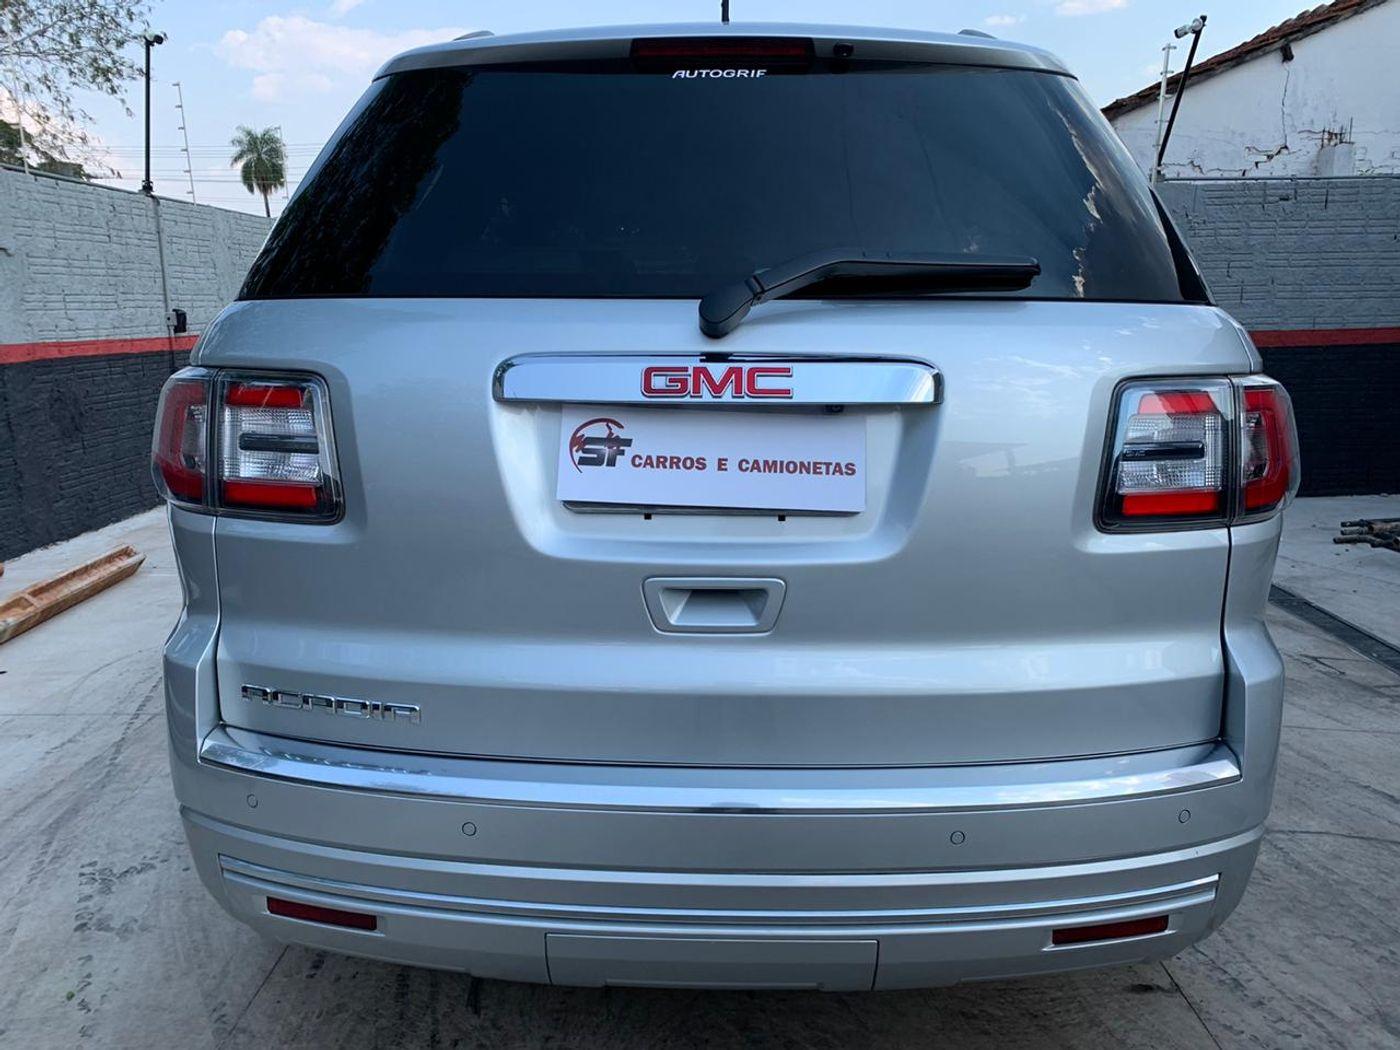 GMC SLT 3.6 V6